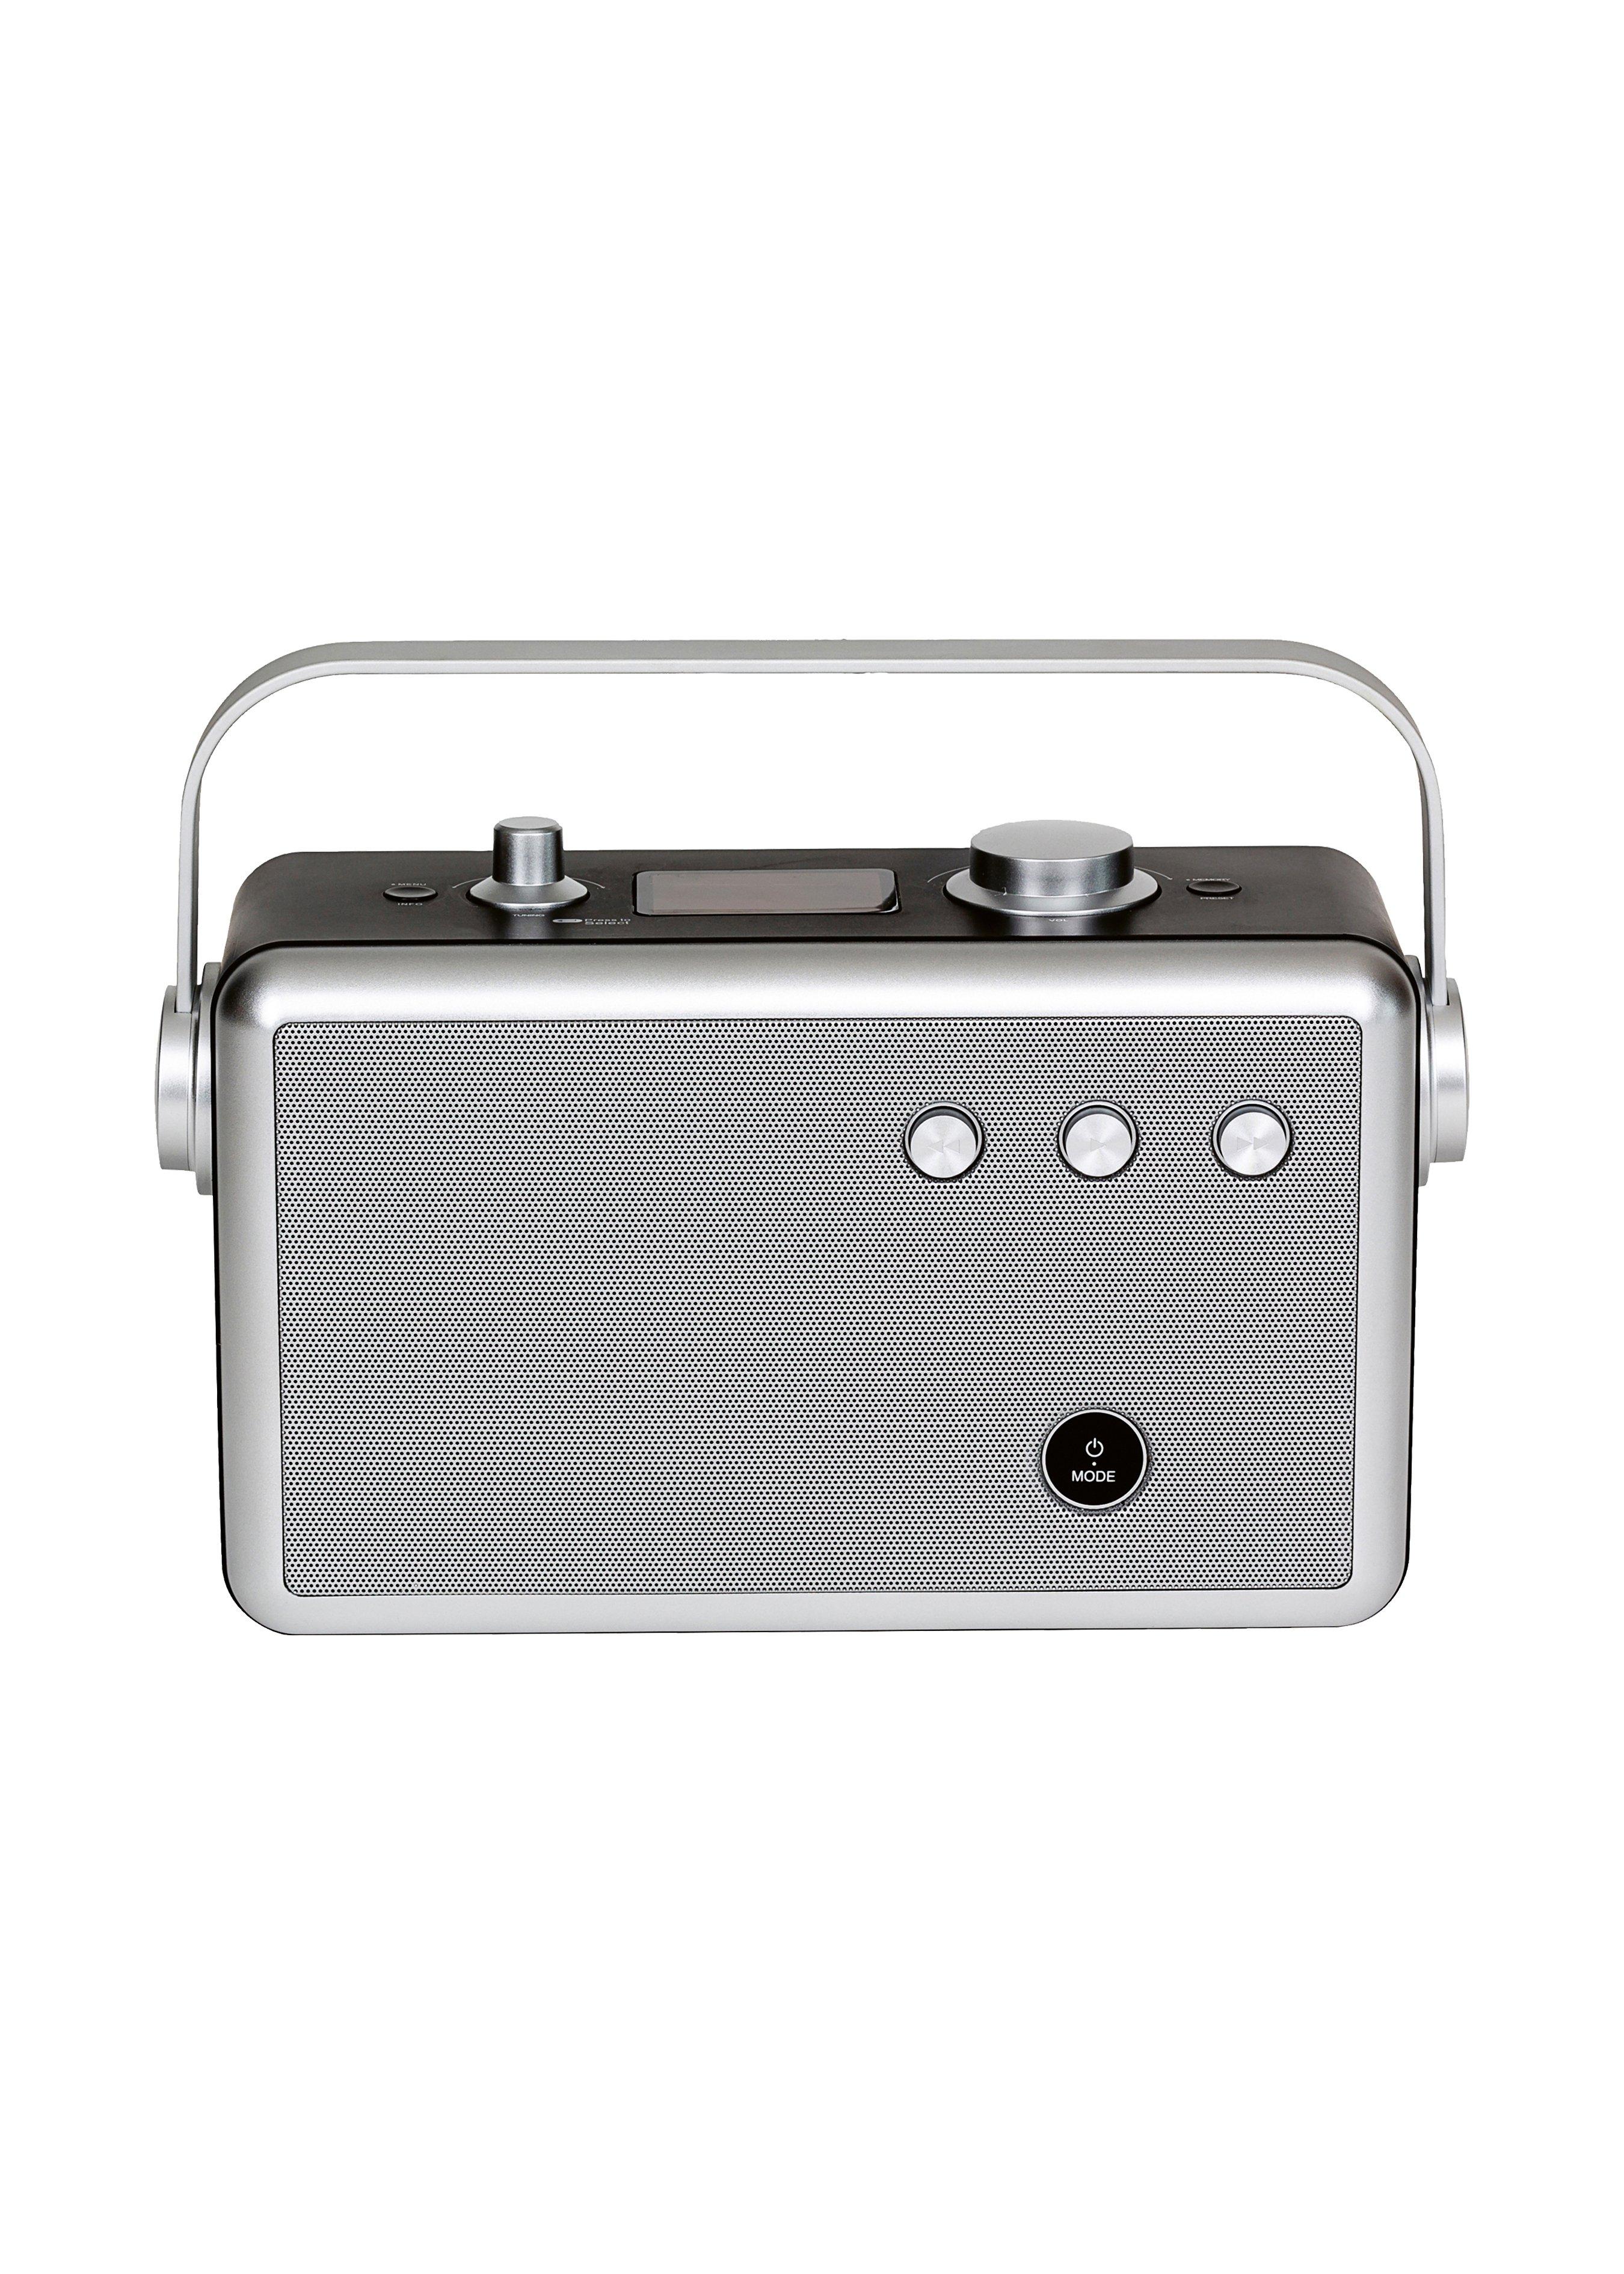 Digitalradio mit DAB+, UKW und Bluetooth 254401 1